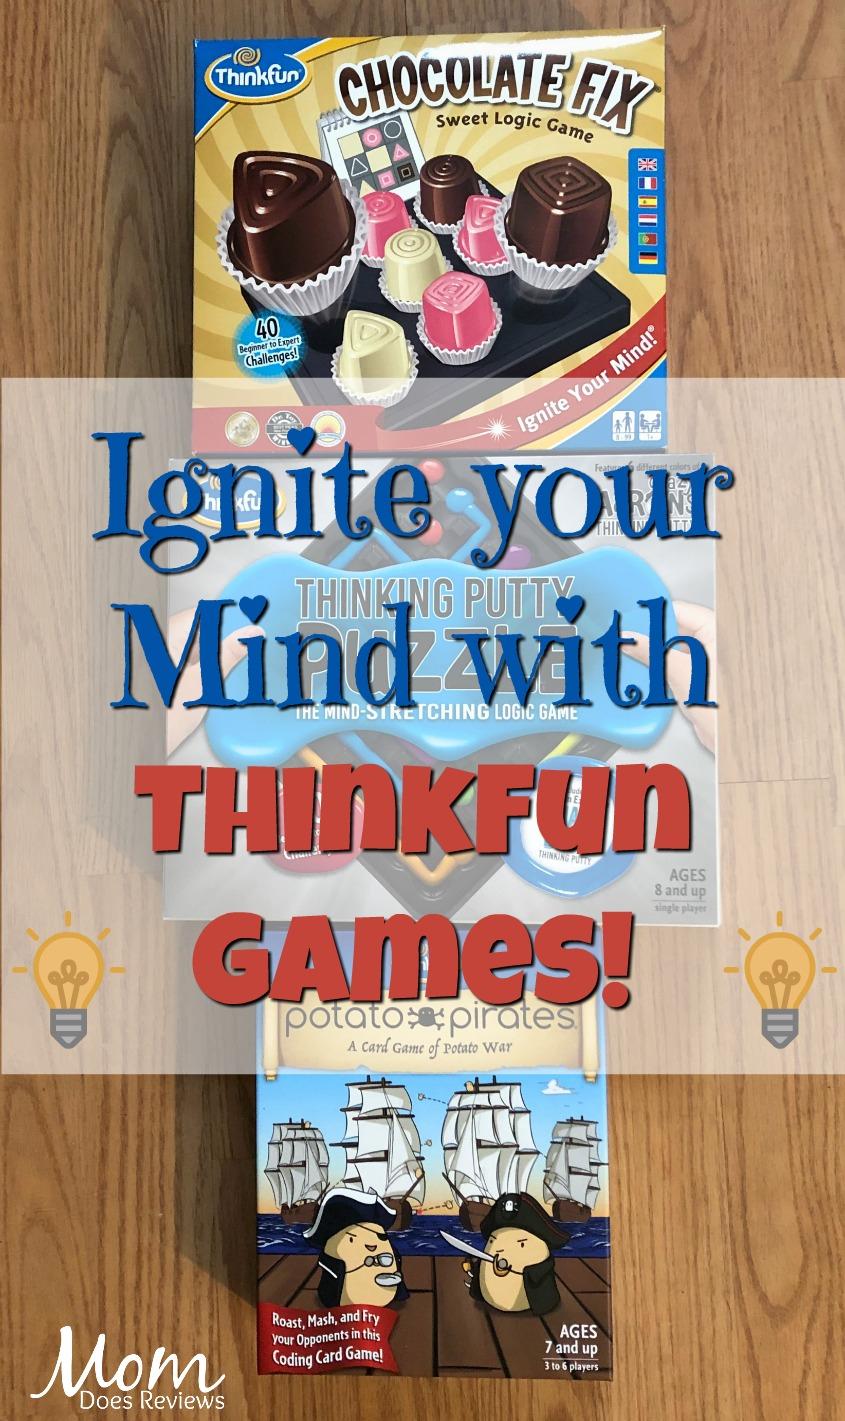 Think Fun Games- Fun Your Family will LOVE! #Sweet2019